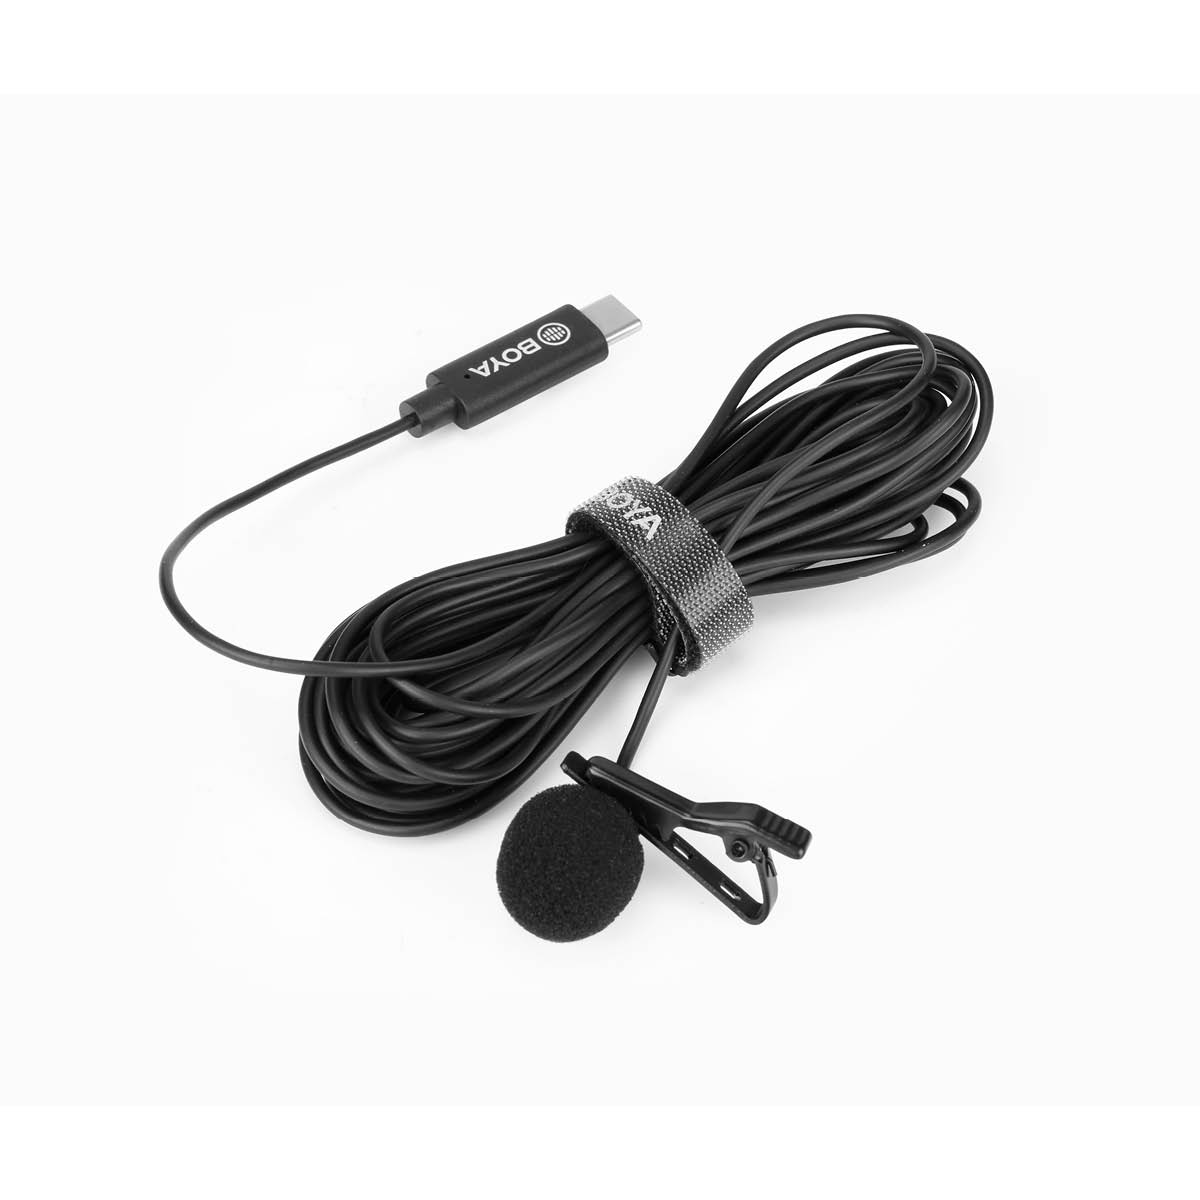 Boya BY-M3 Ansteckmikrofon für USB Type-C